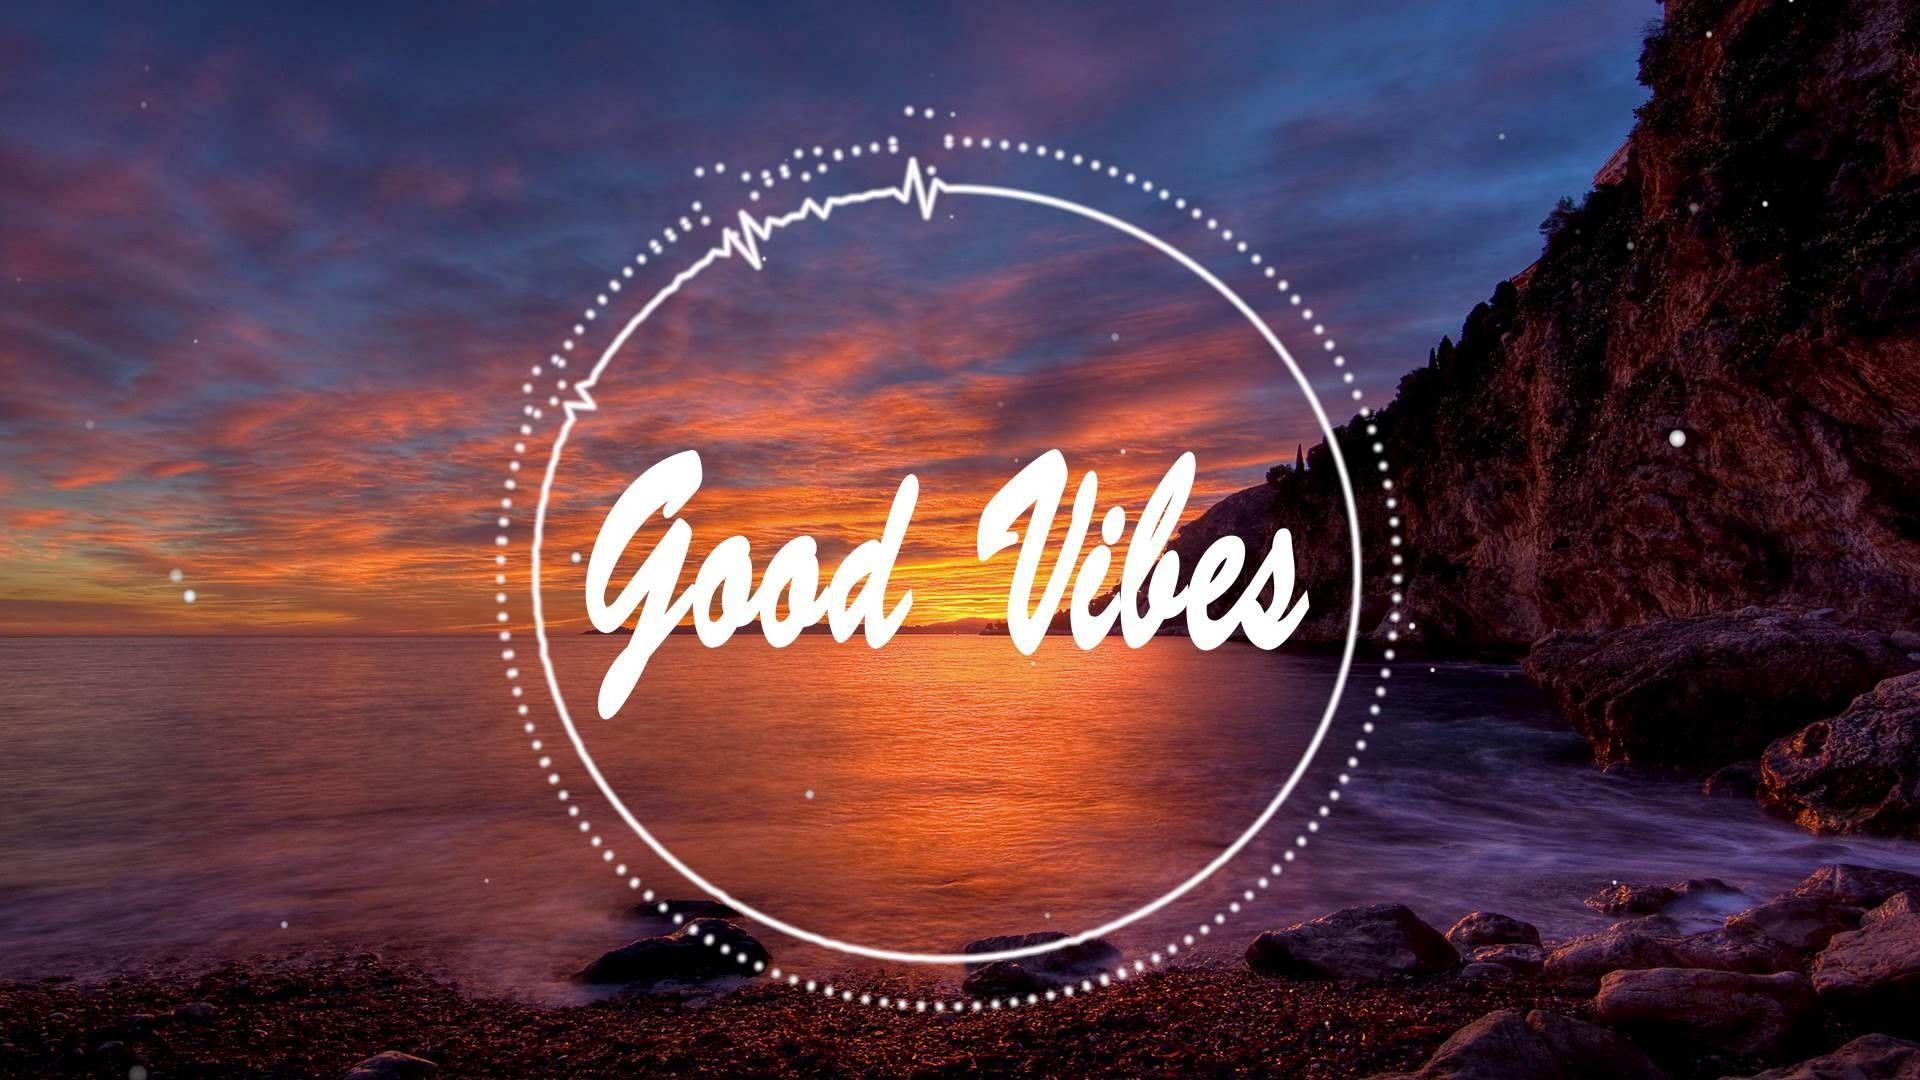 Good Vibes Desktop Wallpapers Top Free Good Vibes Desktop Backgrounds Wallpaperaccess